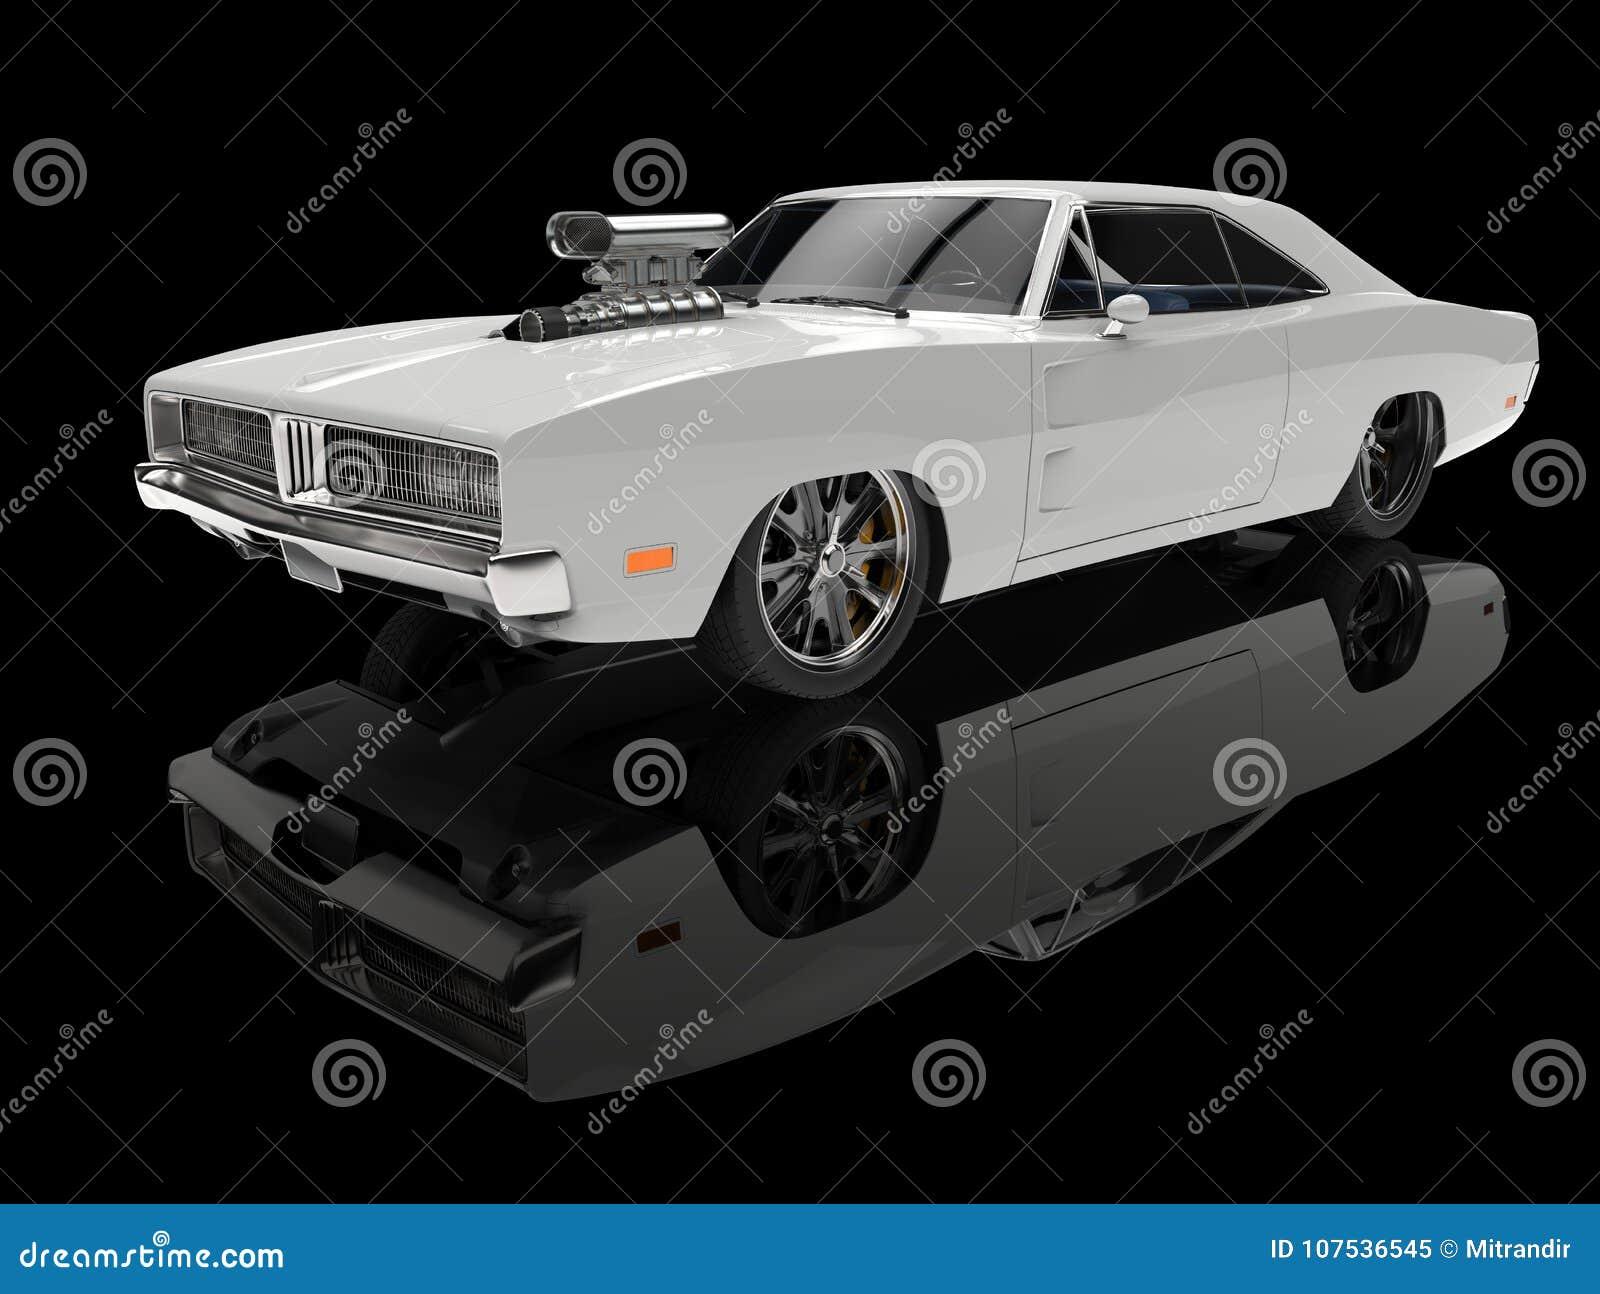 White Vintage American Muscle Car In Black Showroom Stock